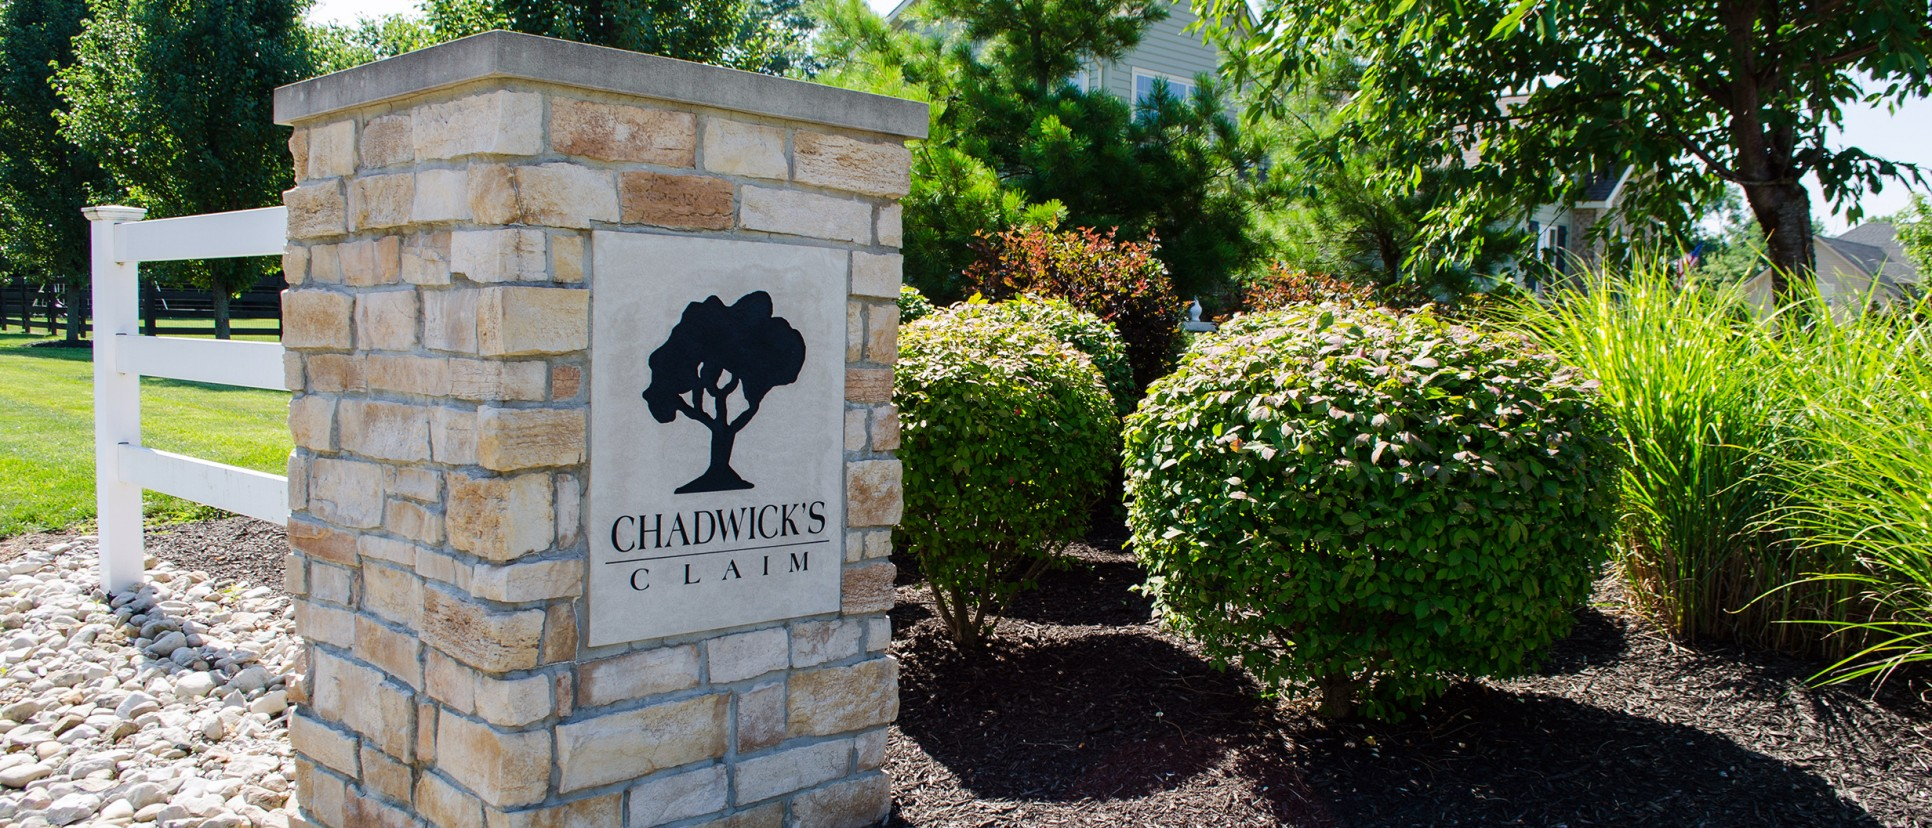 Chadwick's Claim in Springboro, Ohio